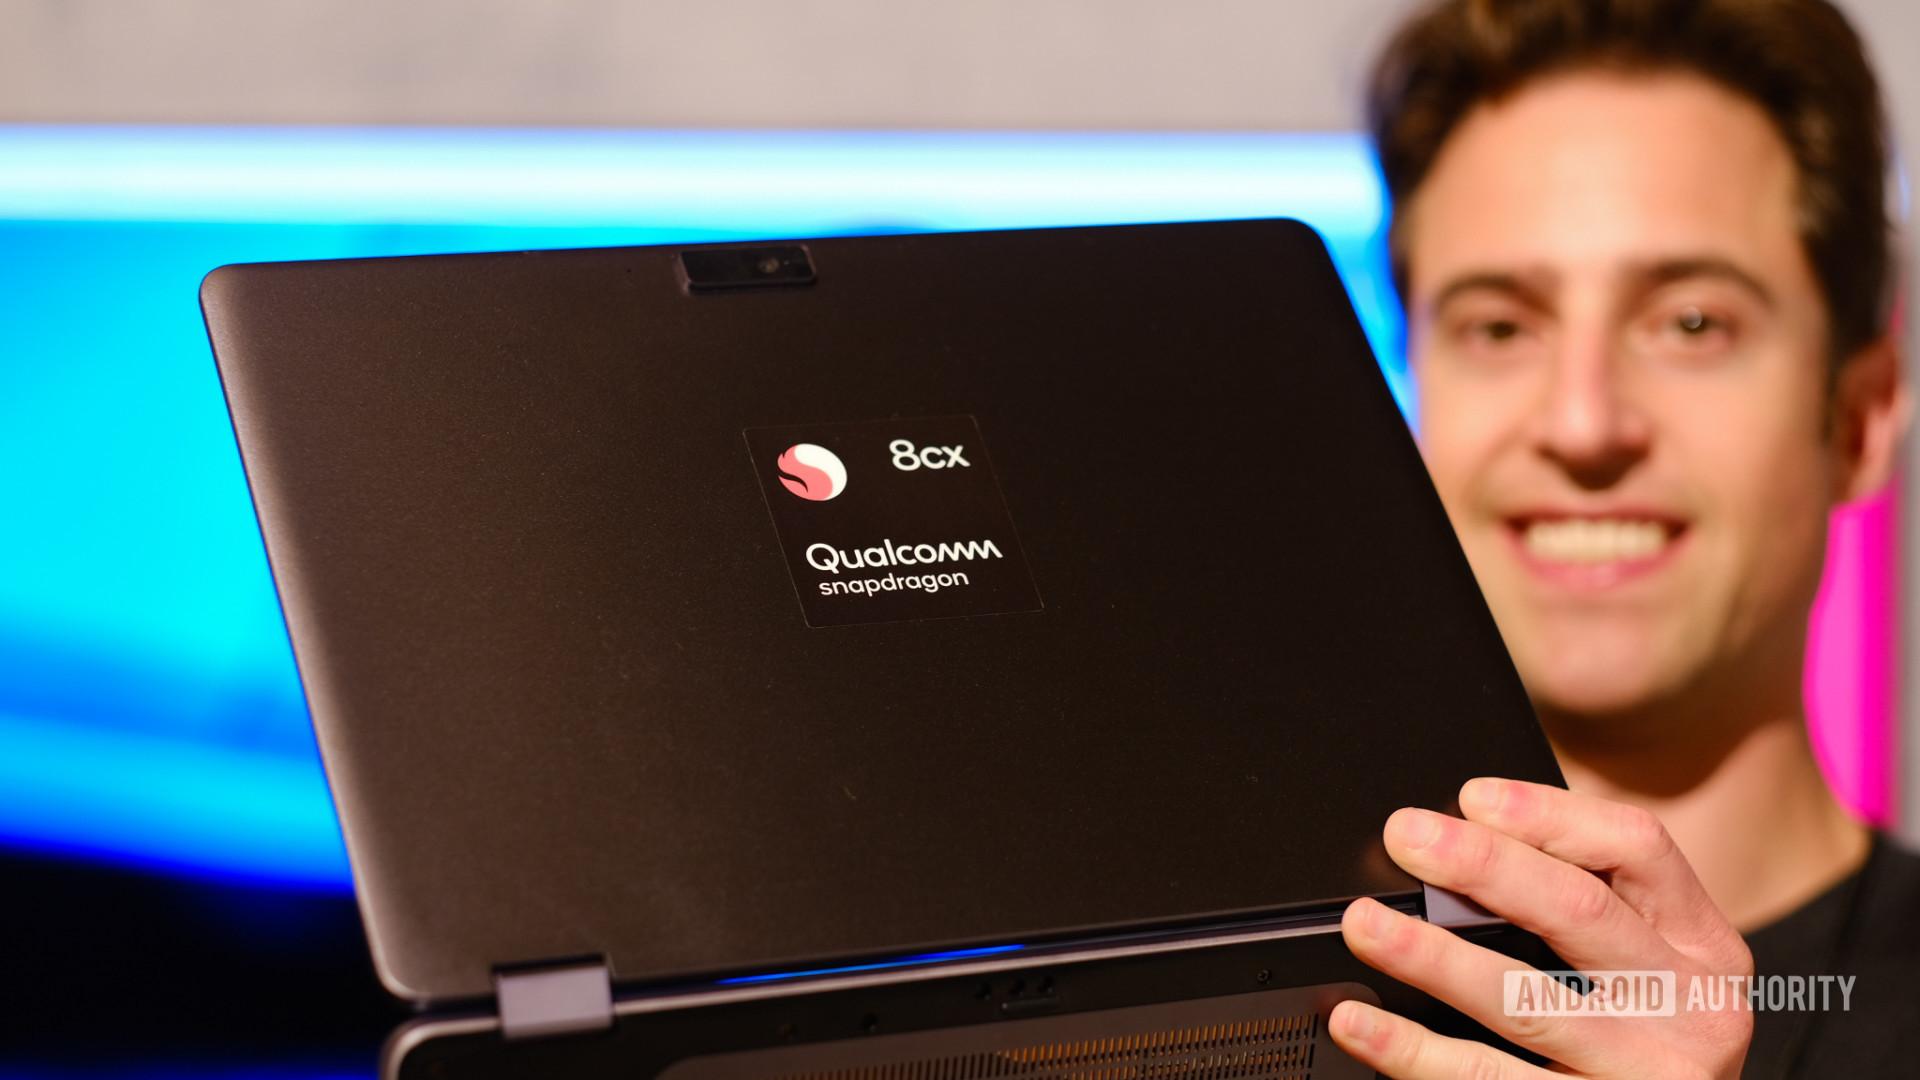 qualcomm 8cx powered laptop